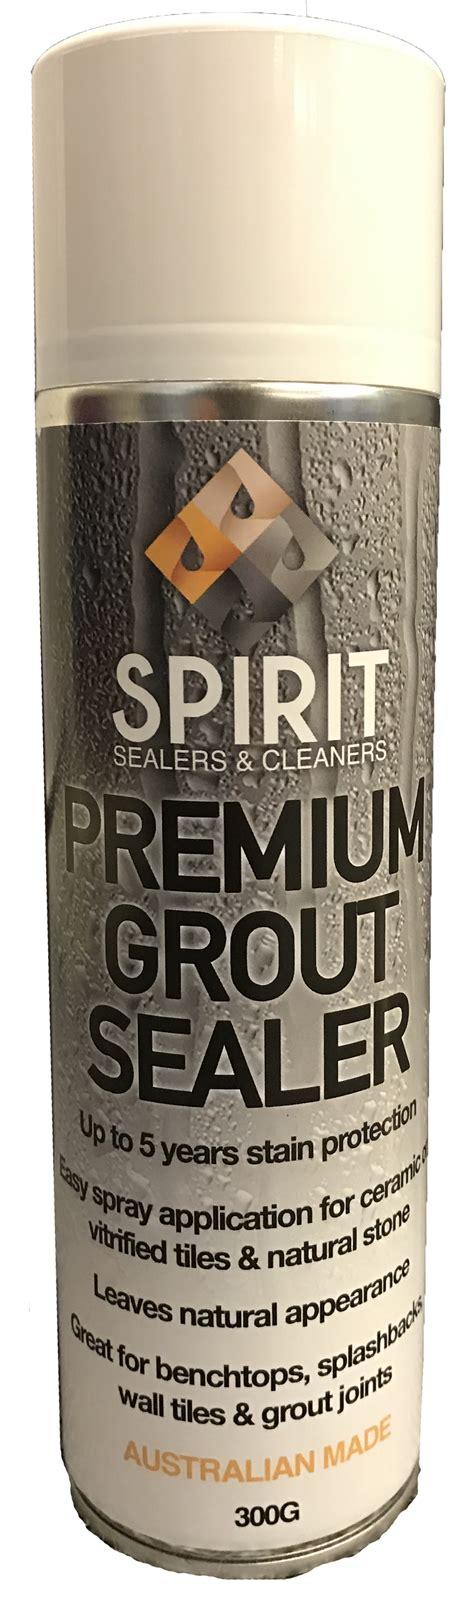 spirit premium grout sealer spirit sealers